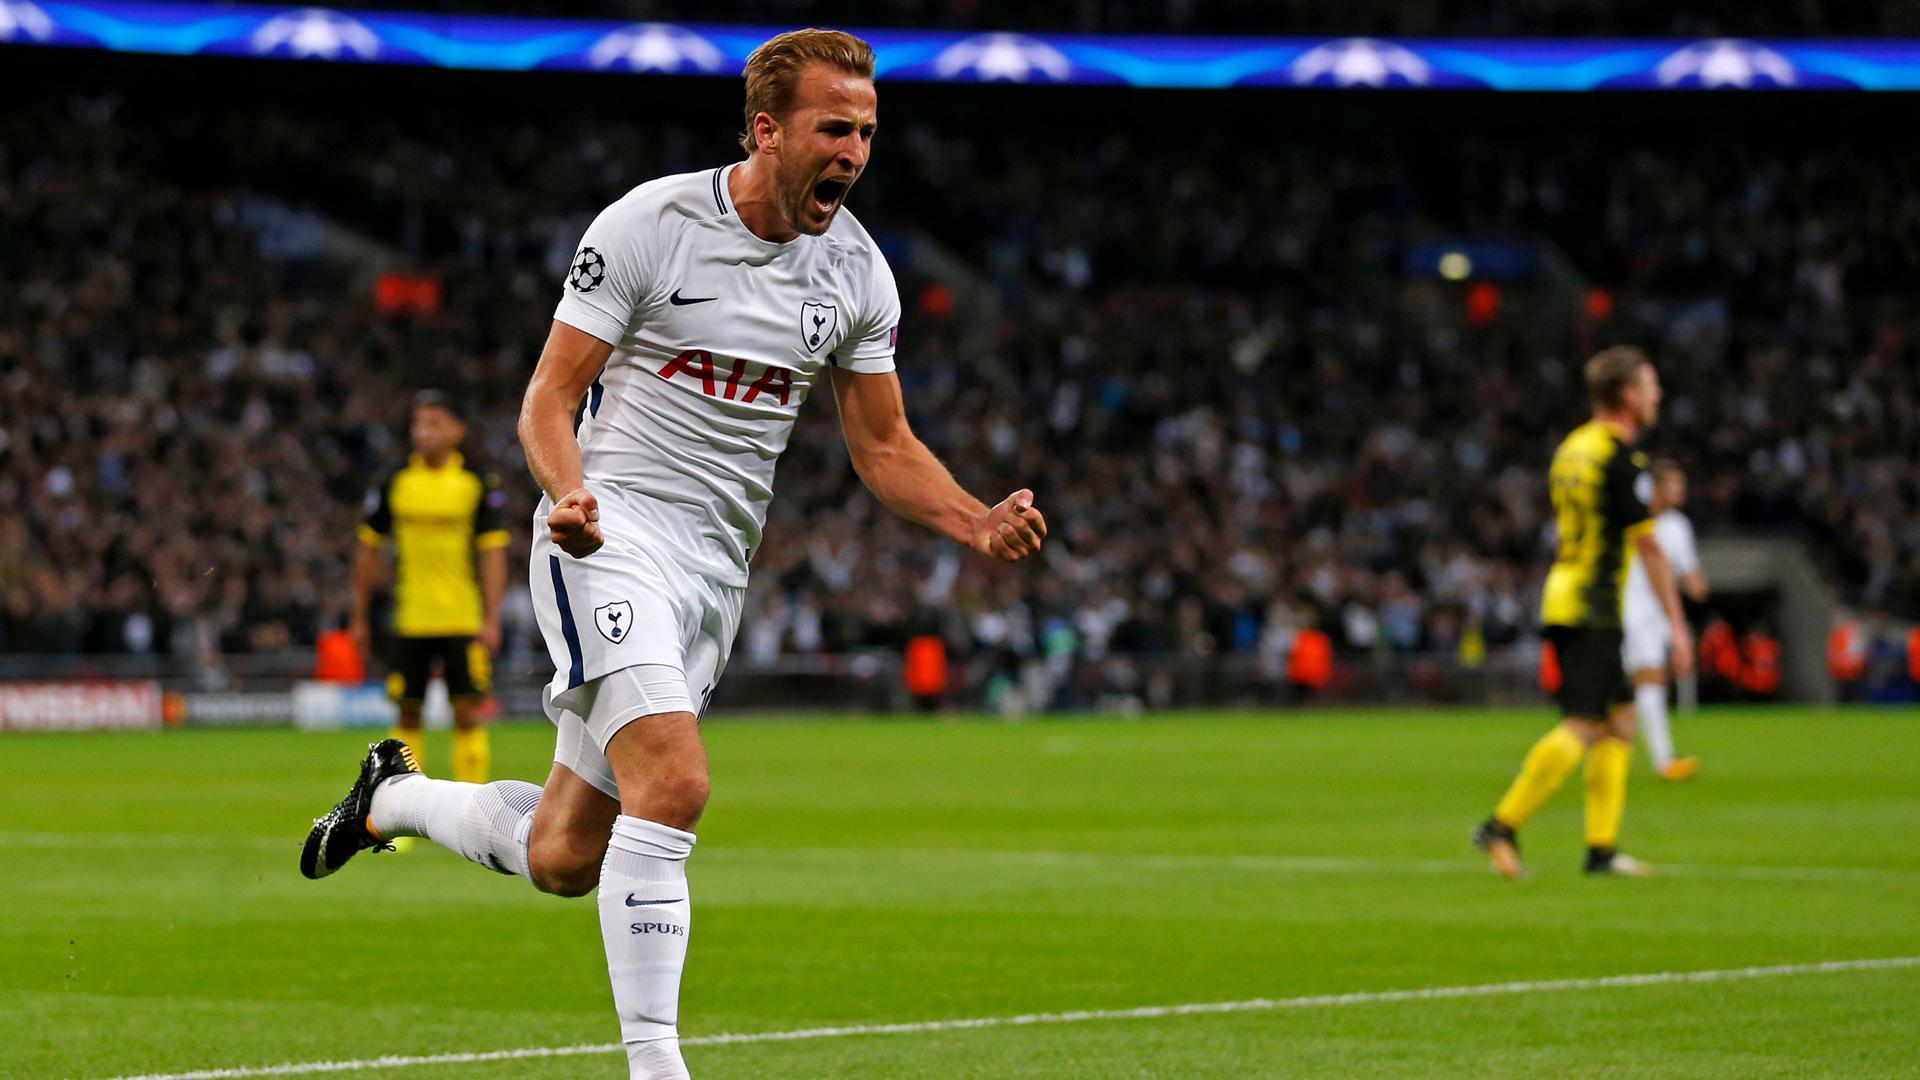 Tottenham Hotspur Programm UEFA CL 2017//18 Borussia Dortmund